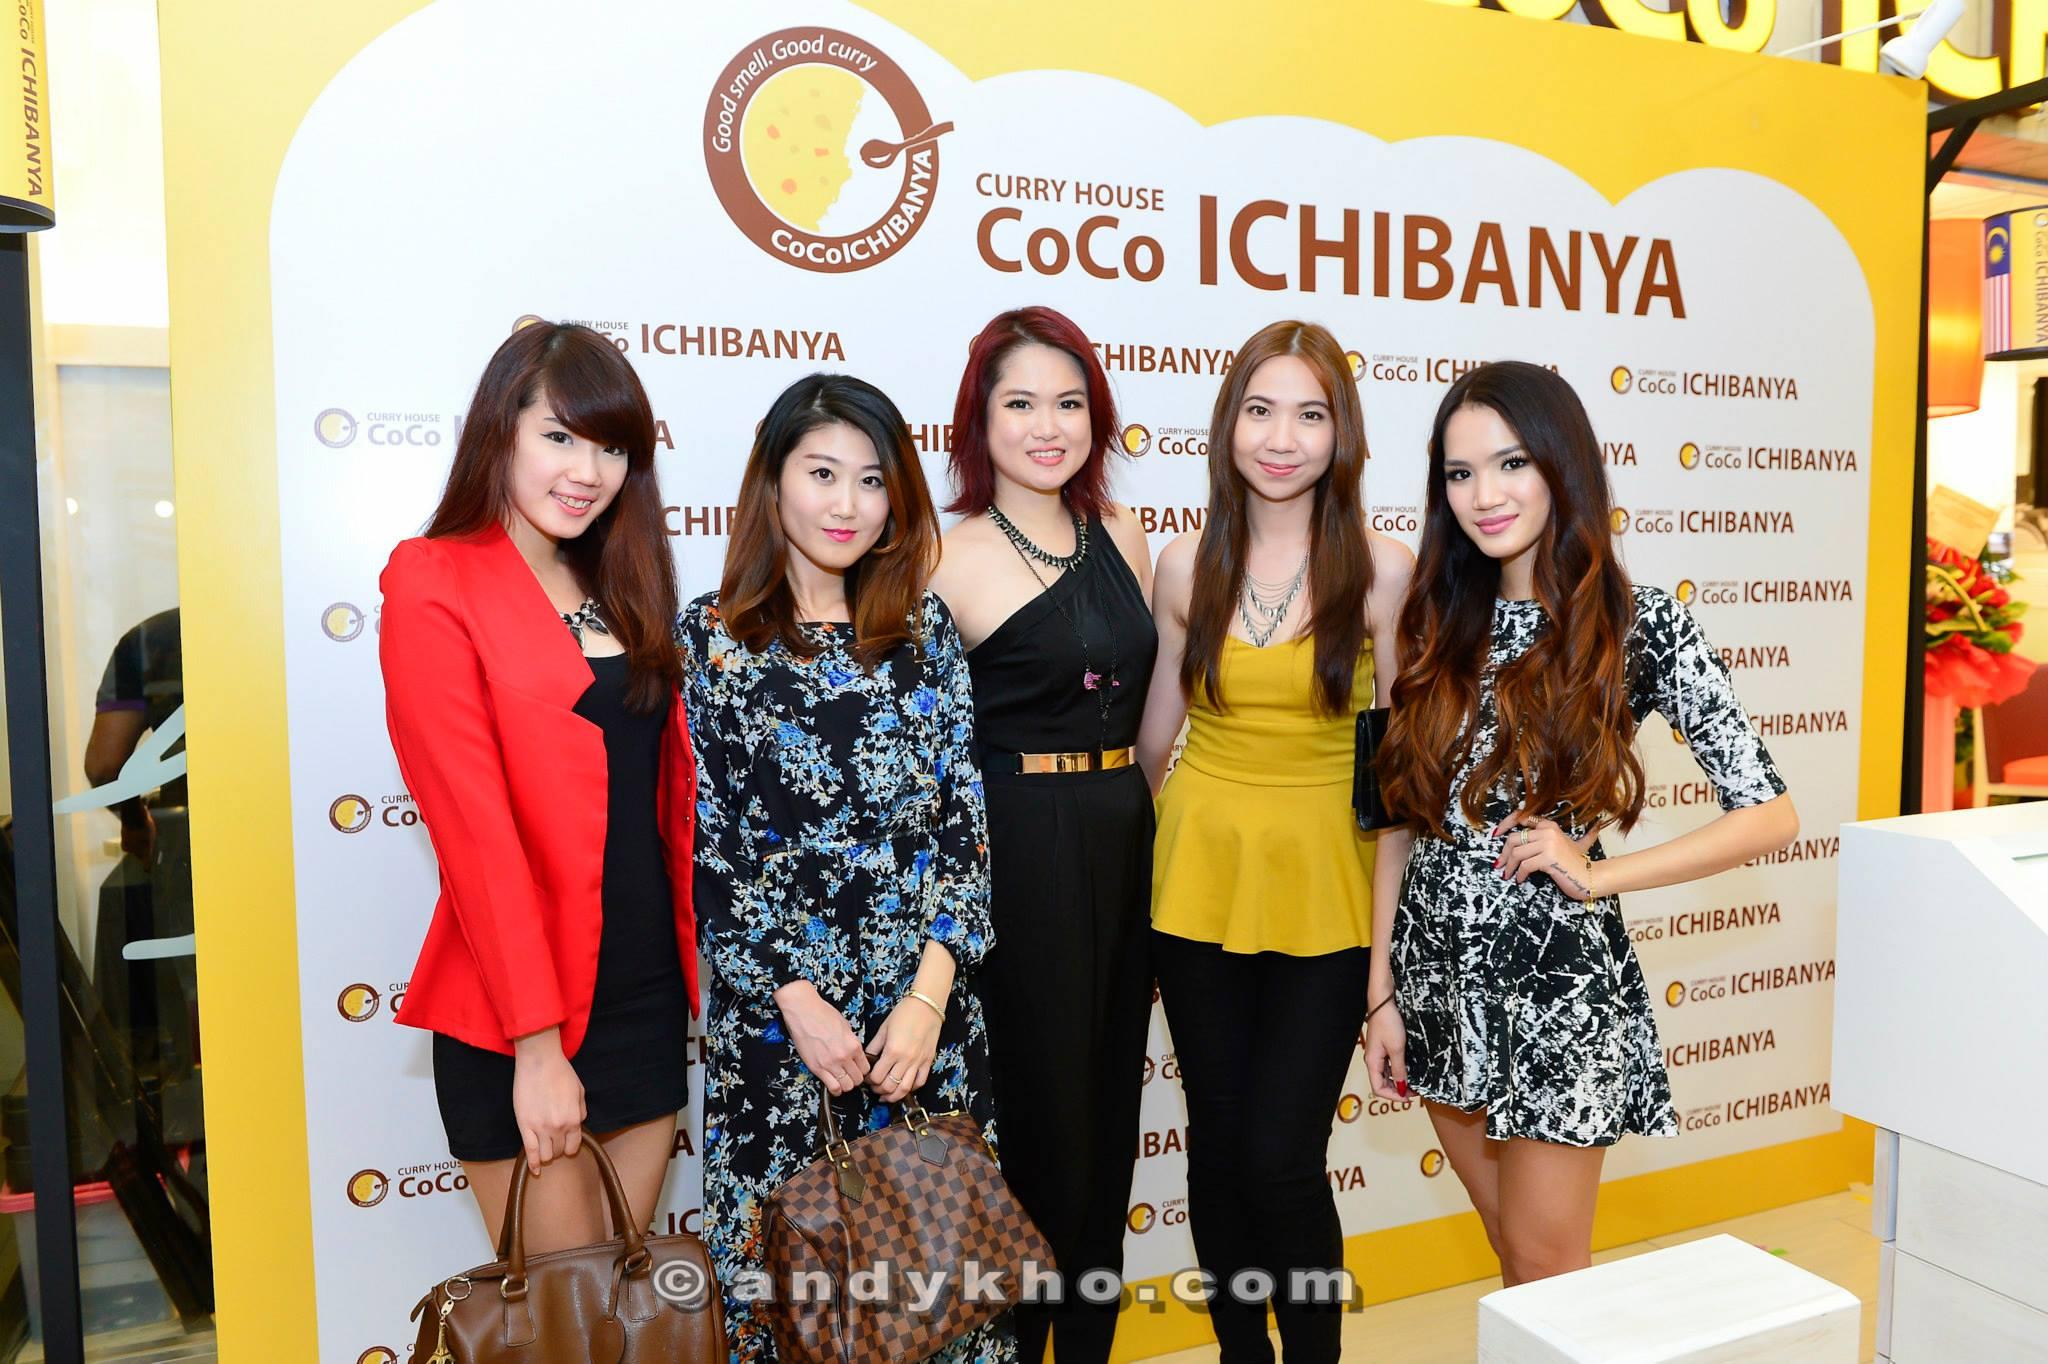 Grand Opening Of Coco Ichibanya In Malaysia